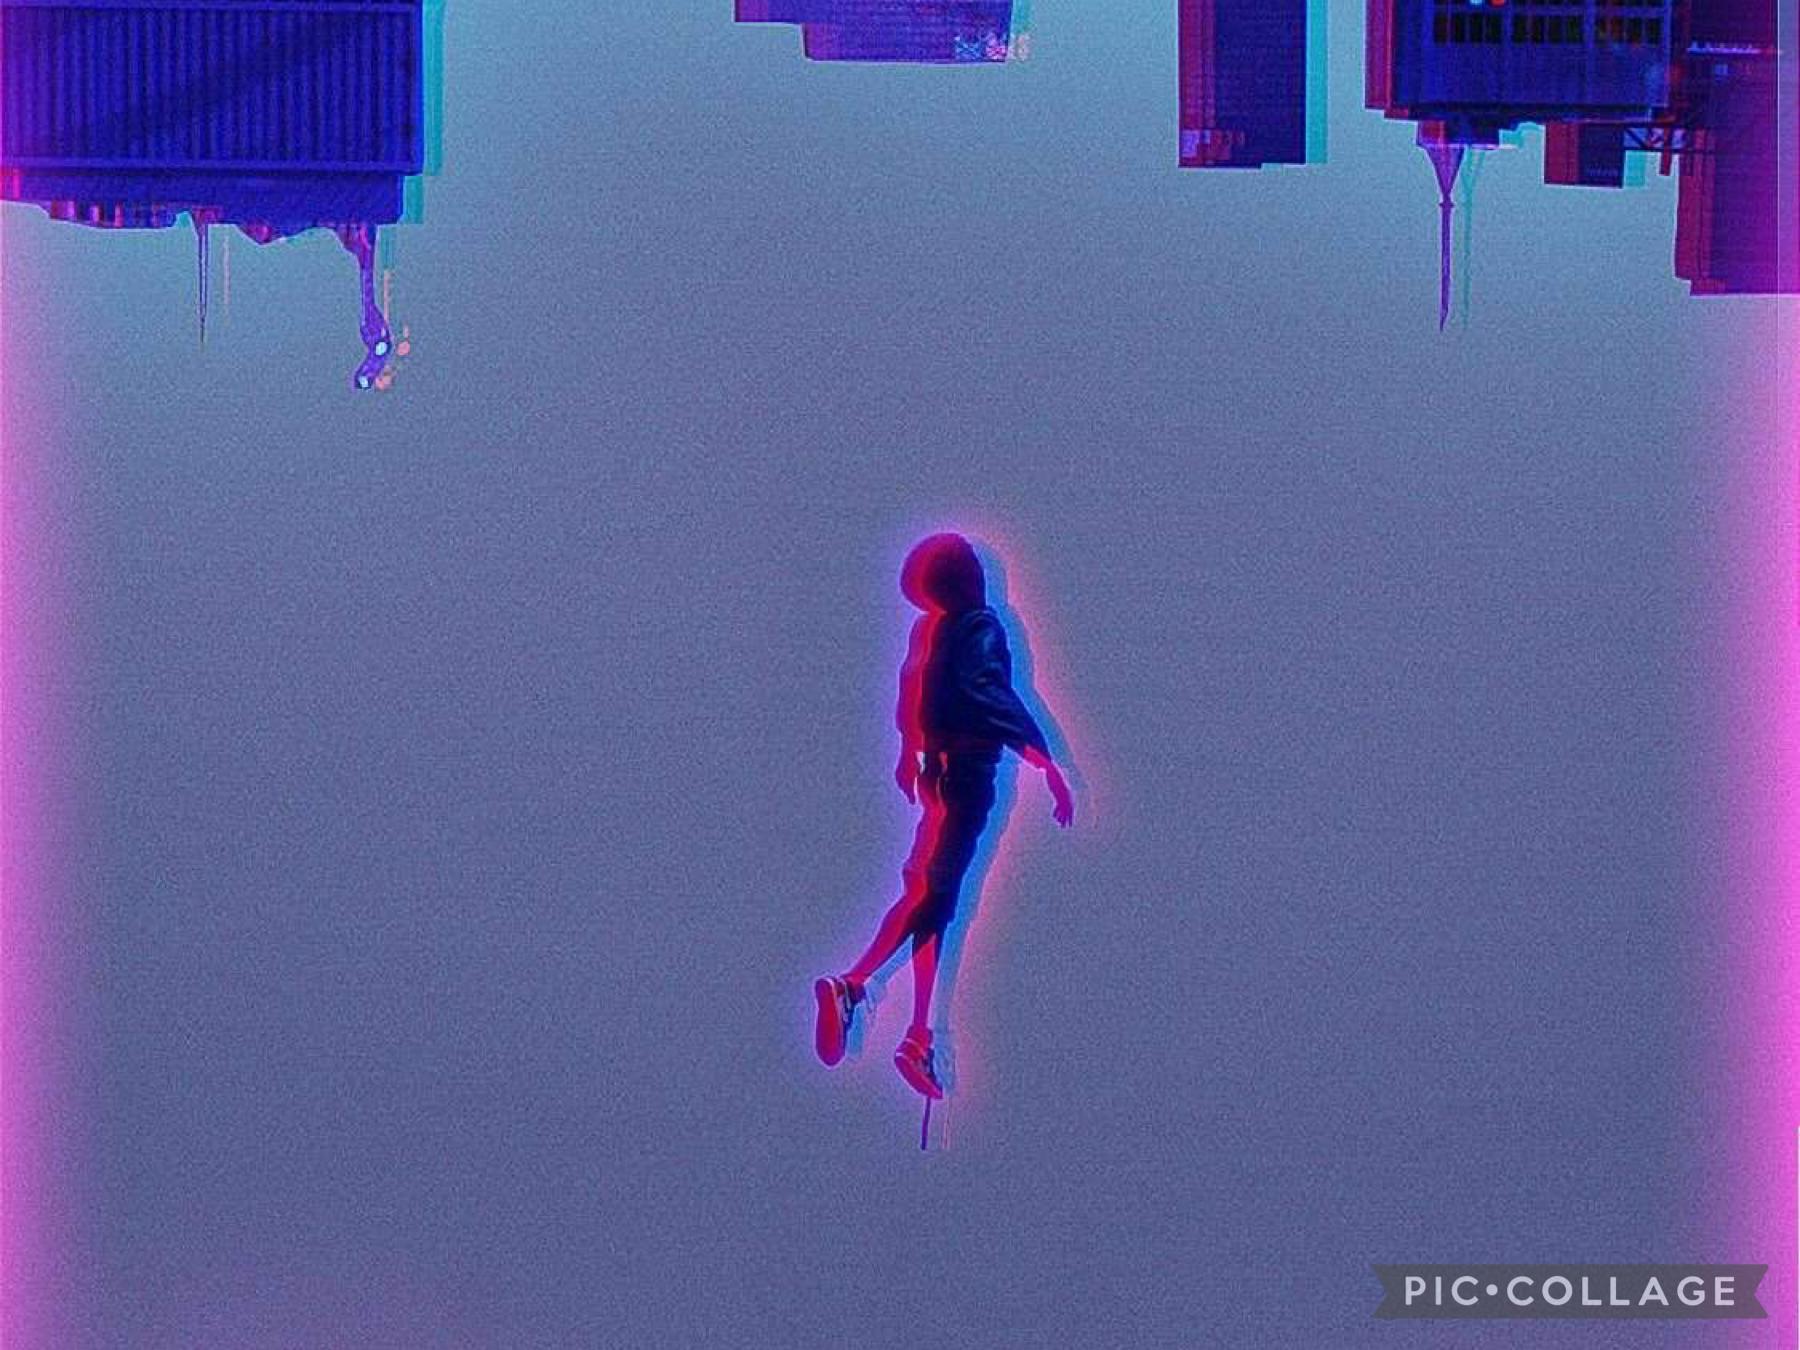 Collage by deku_15